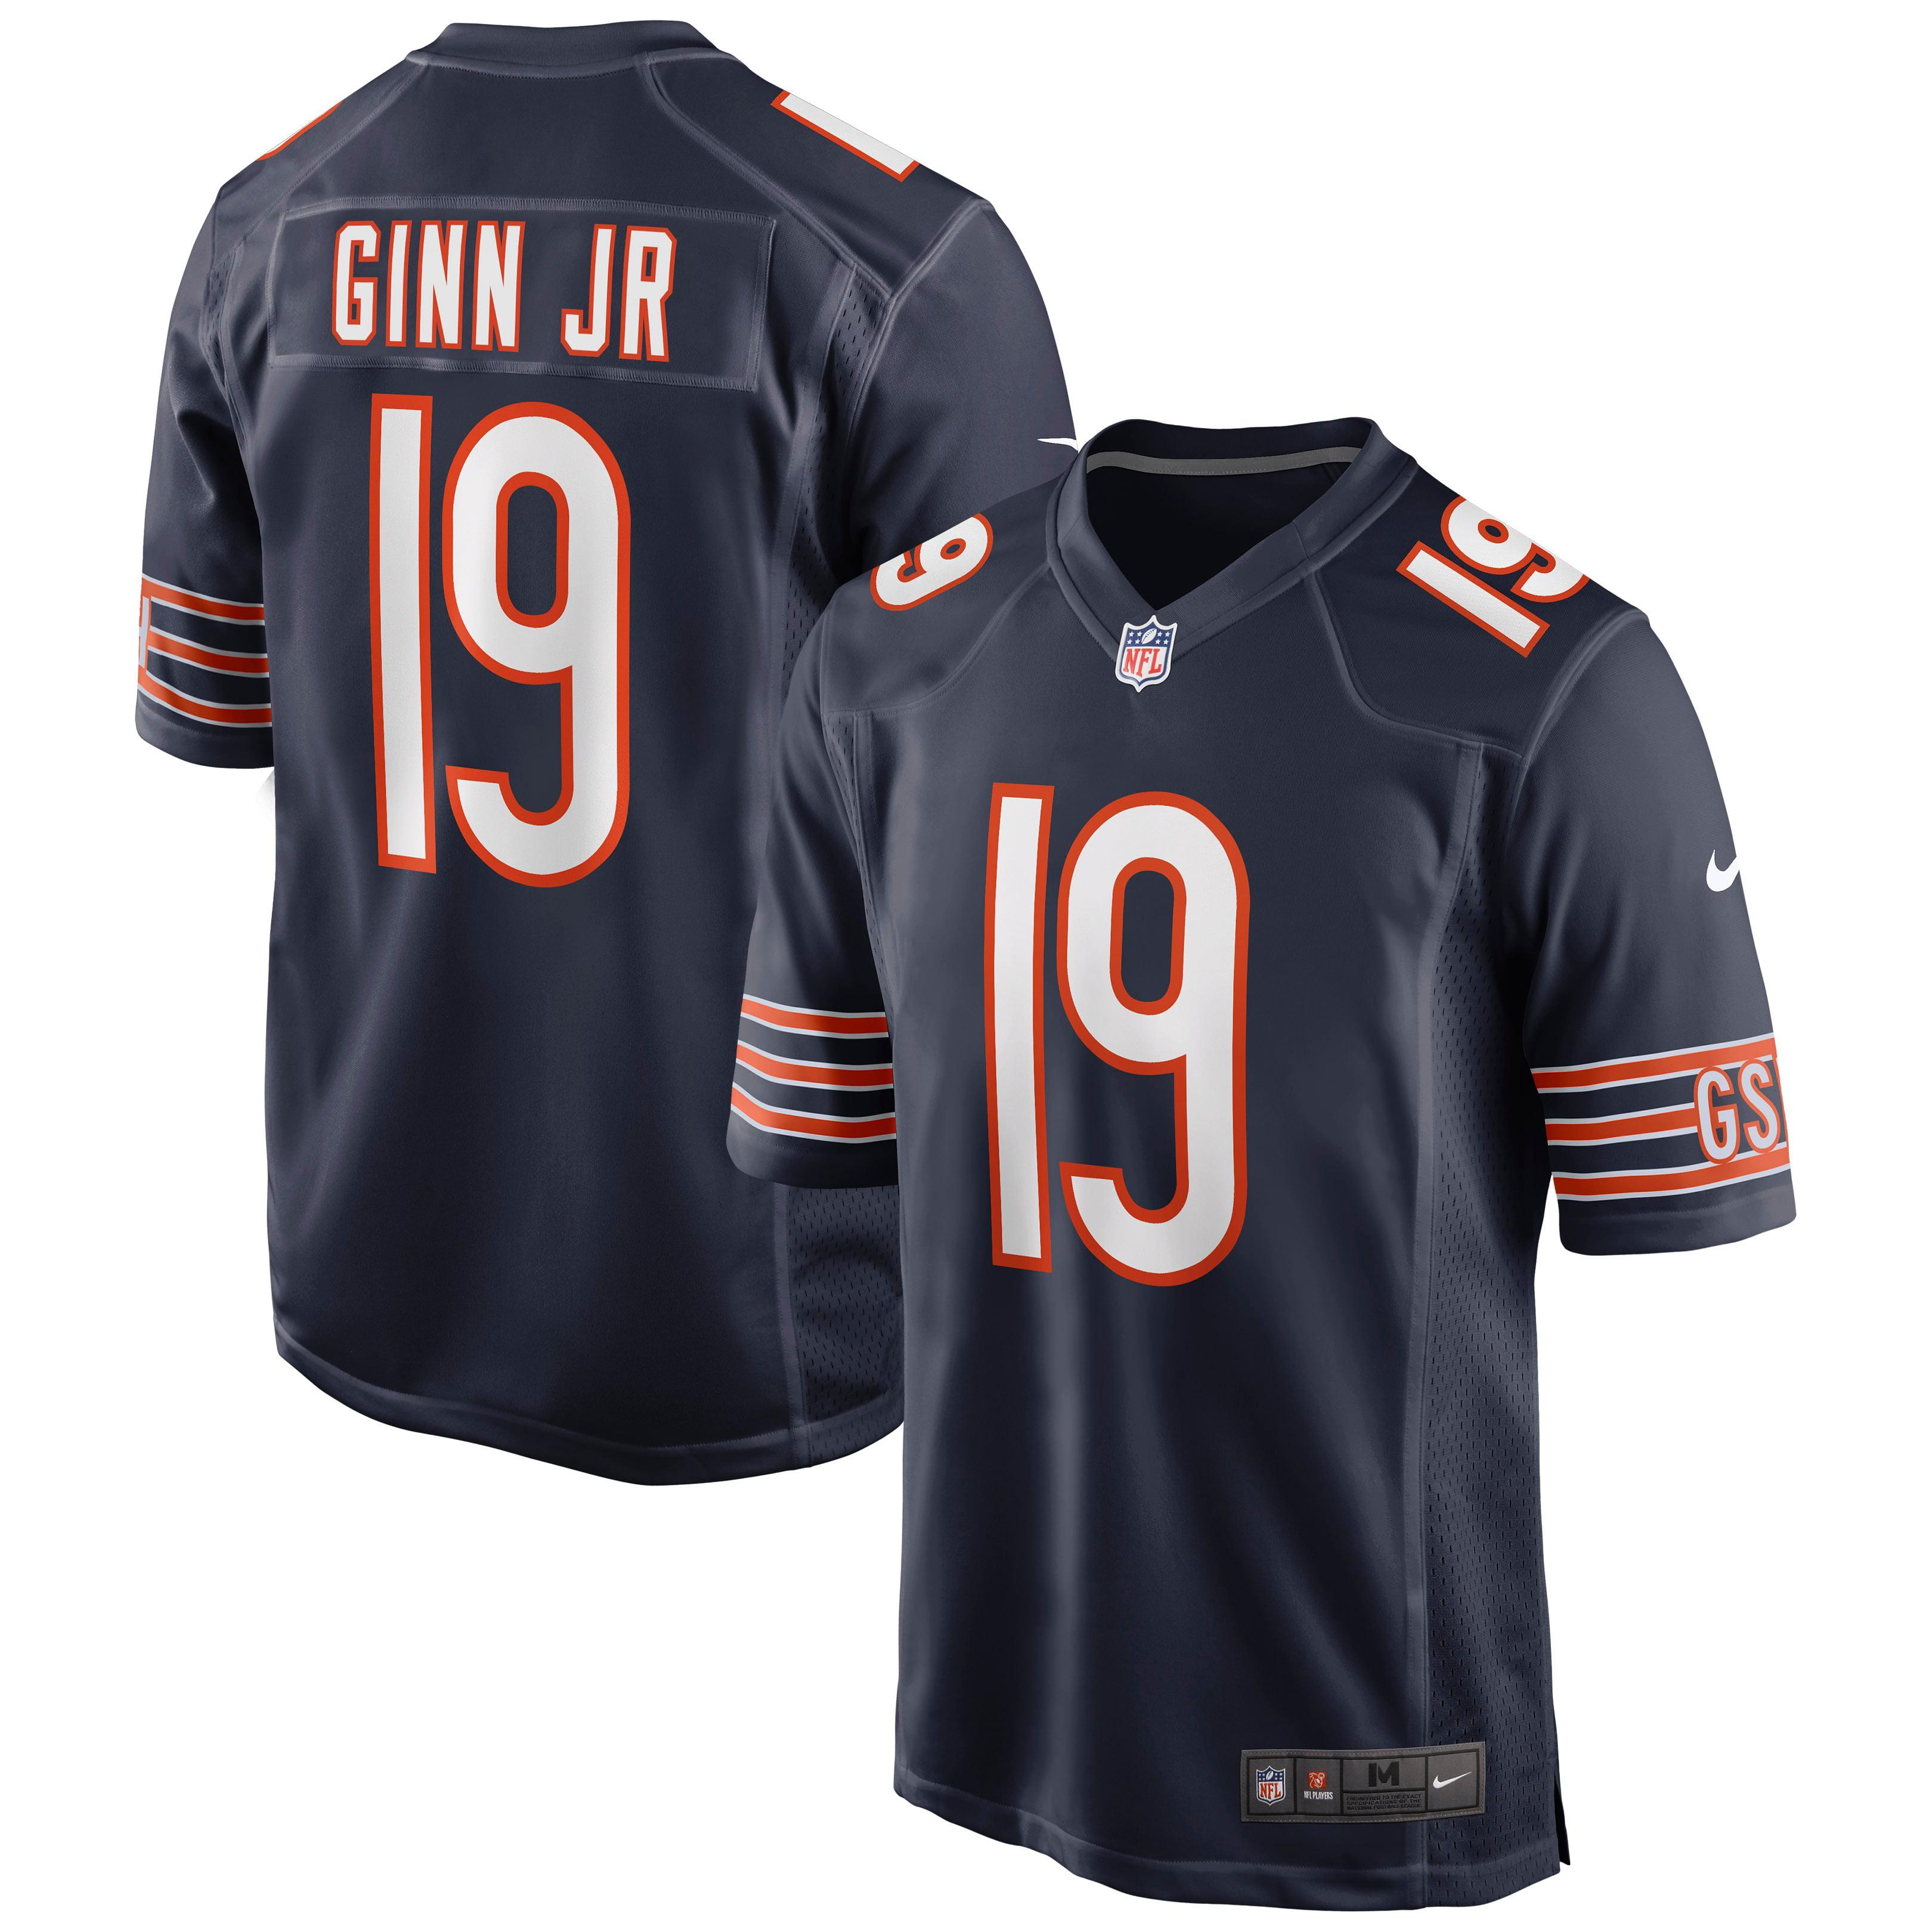 Ted Ginn Jr. Chicago Bears Nike Game Jersey - Navy - Walmart.com